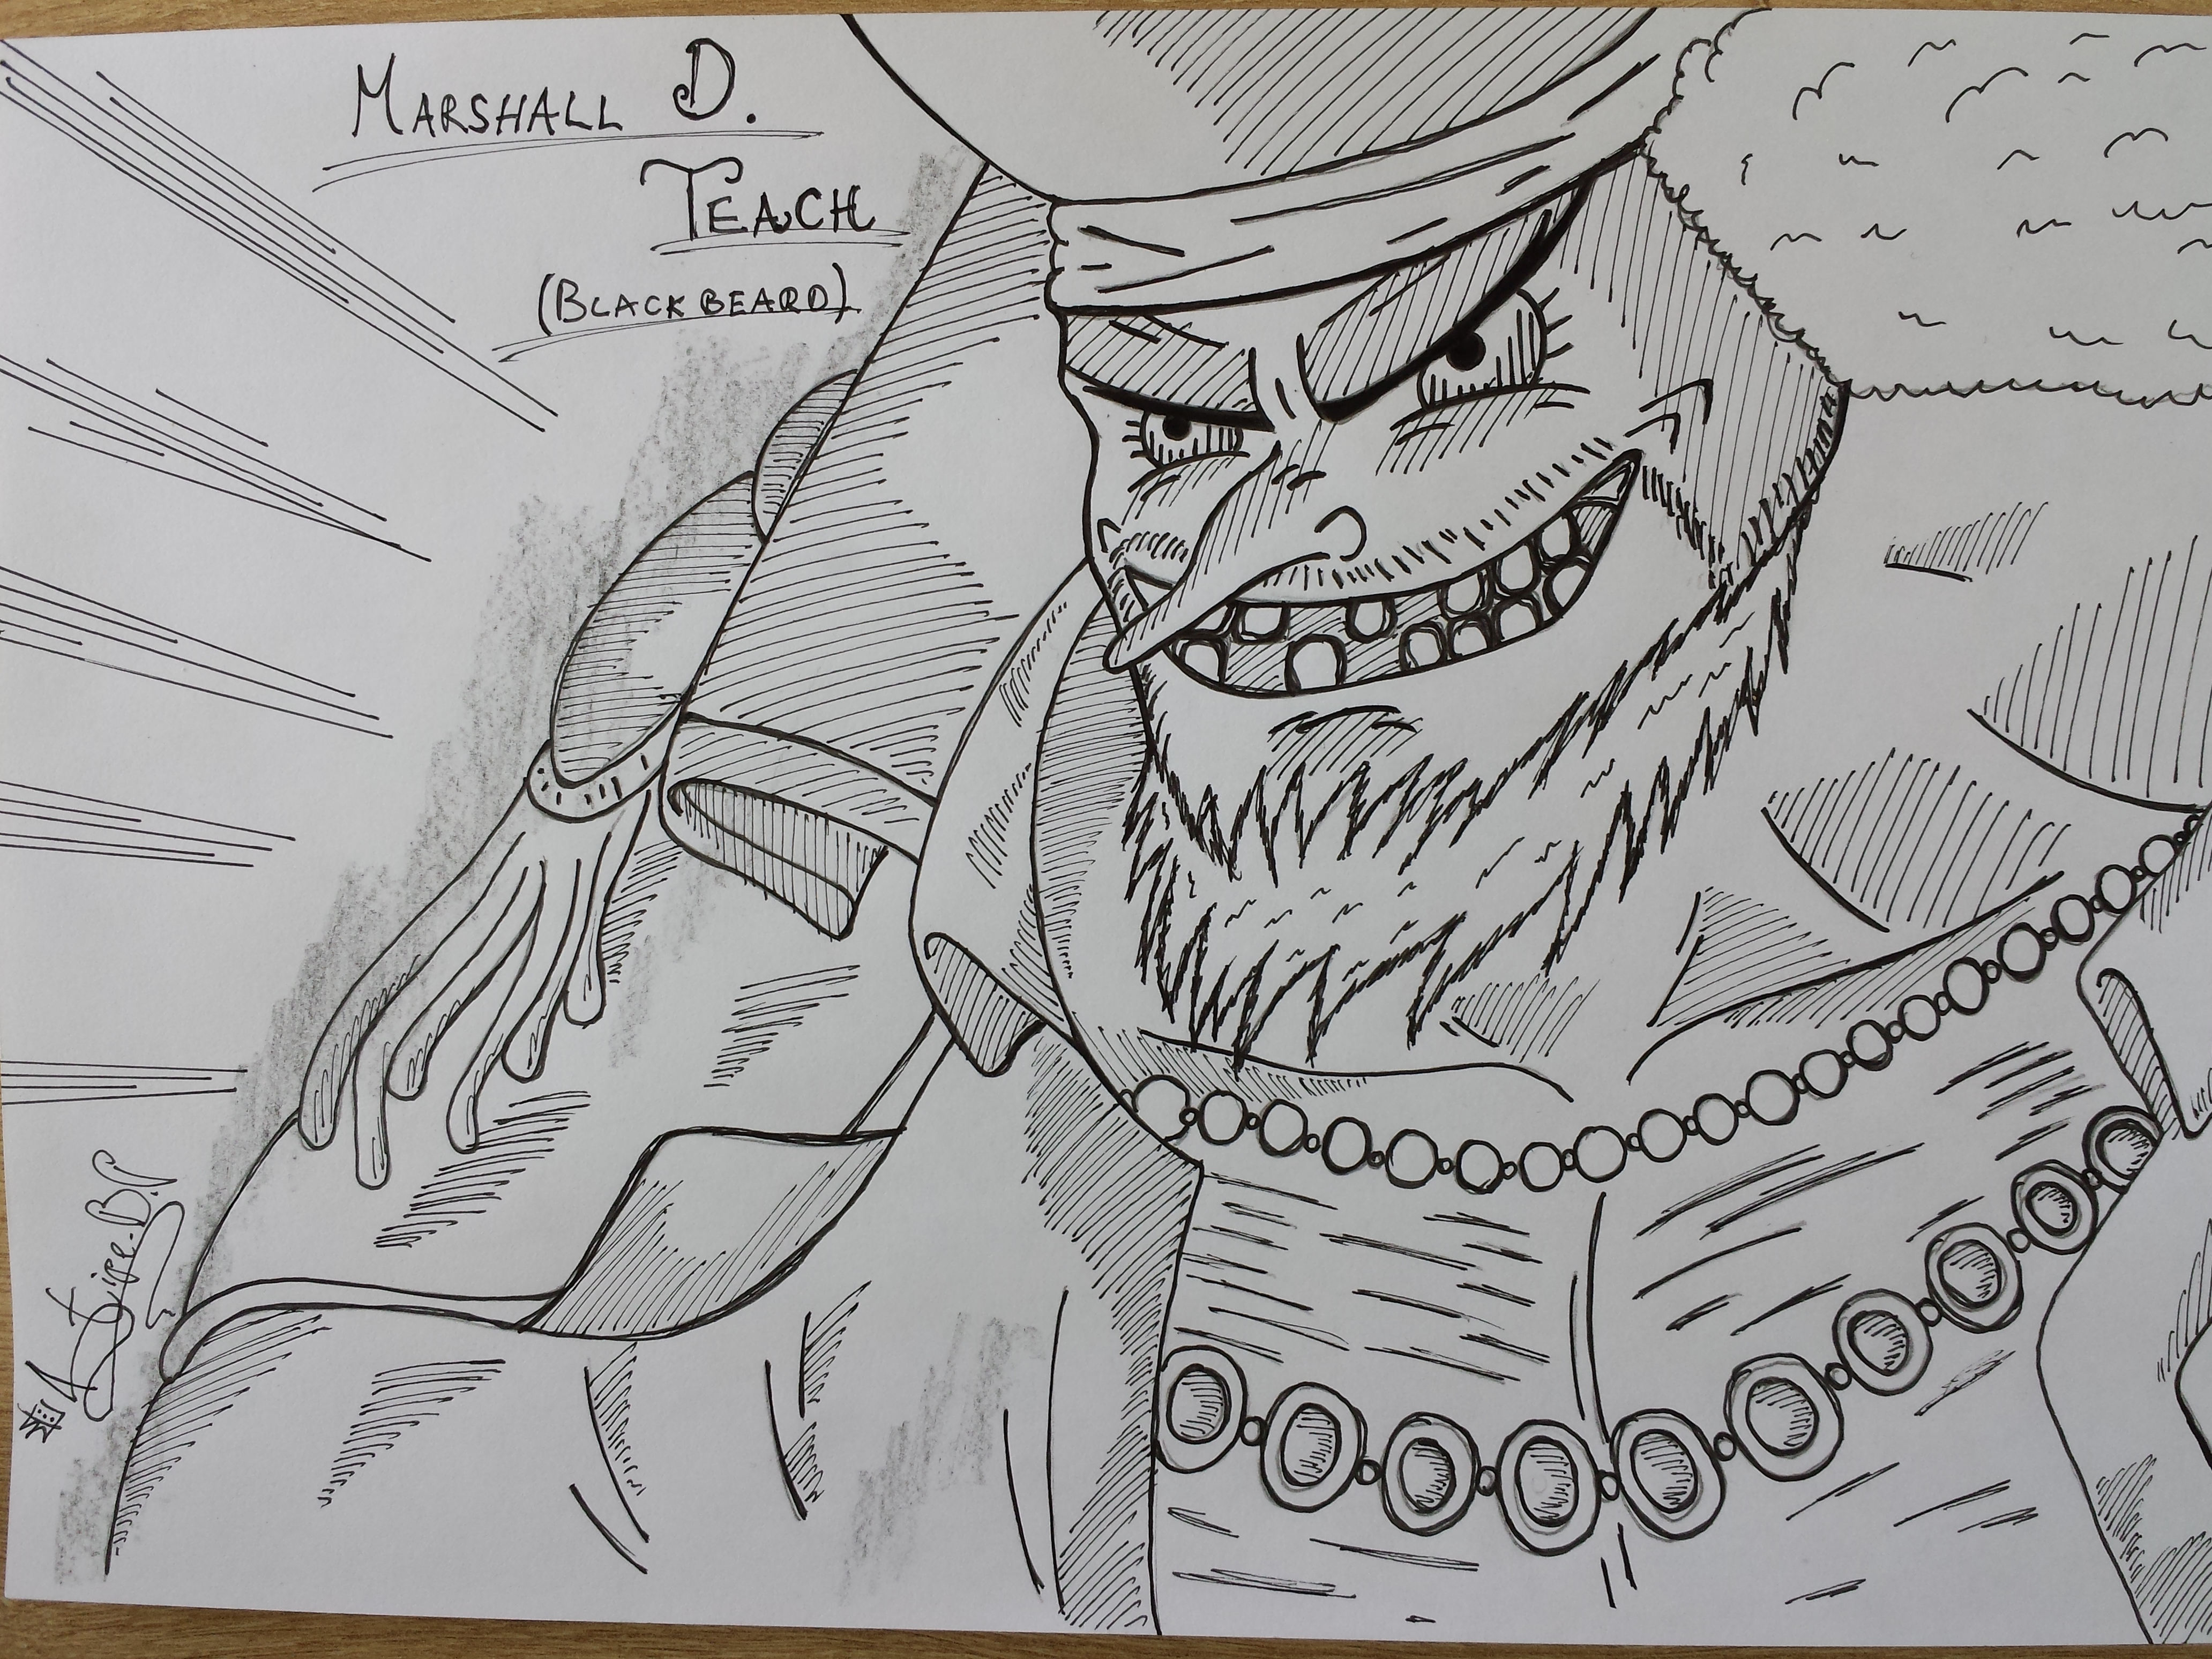 One Piece Lineart : One piece marshall d. teach blackbeard by stipe320 on deviantart